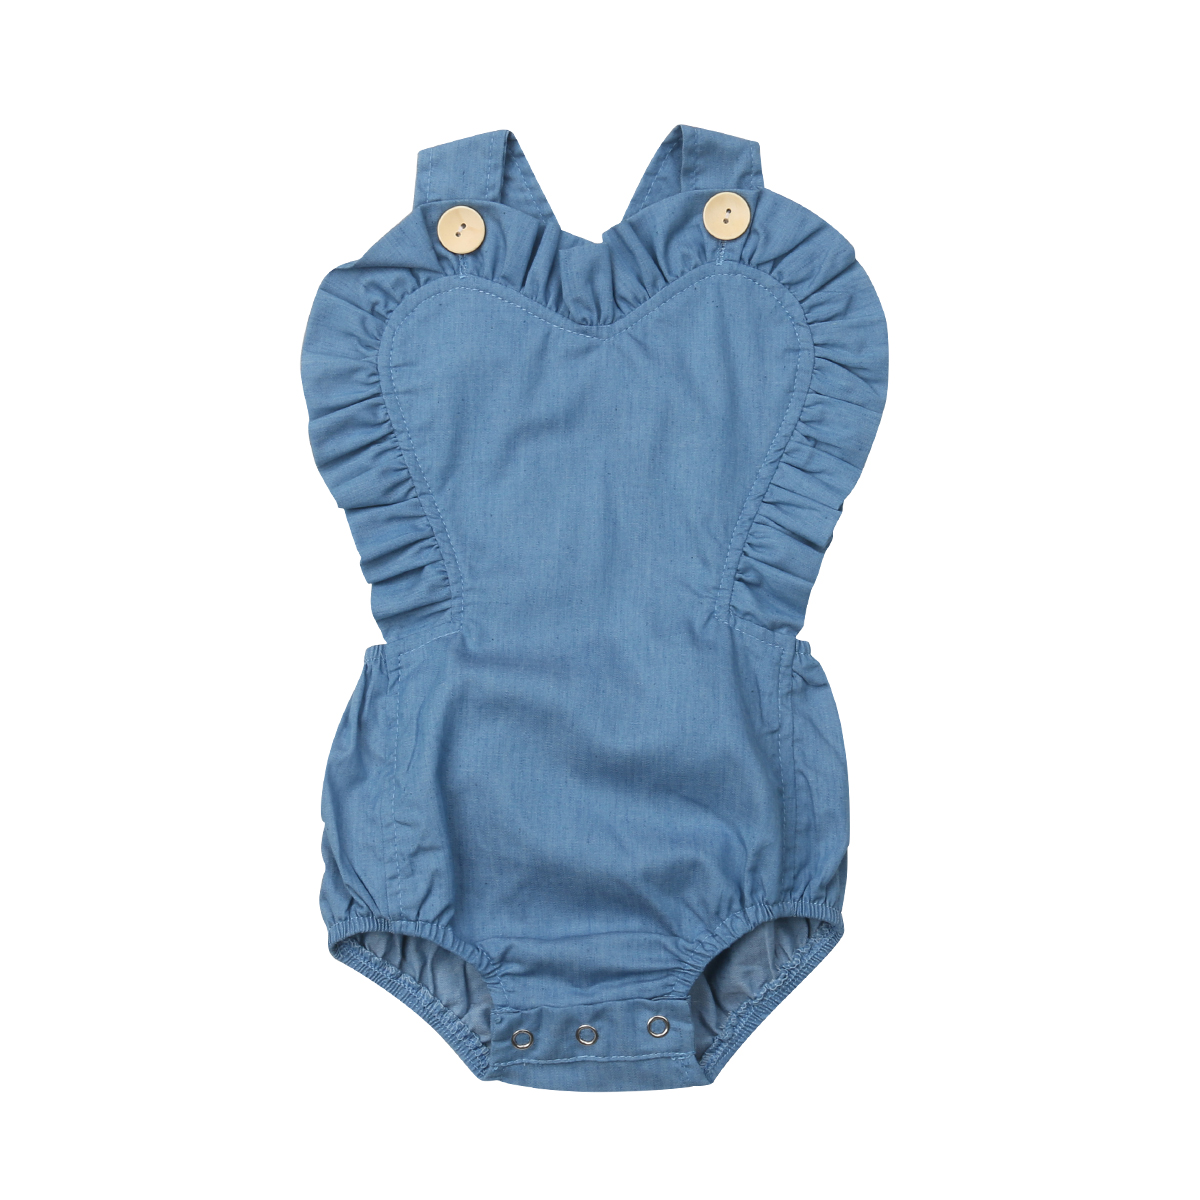 2018 Nieuw Zomer Baby Kids Baby Meisjes Denim Bodysuits Ruches Backless Blauw Jumpsuits Kleding Puur Wit En Doorschijnend